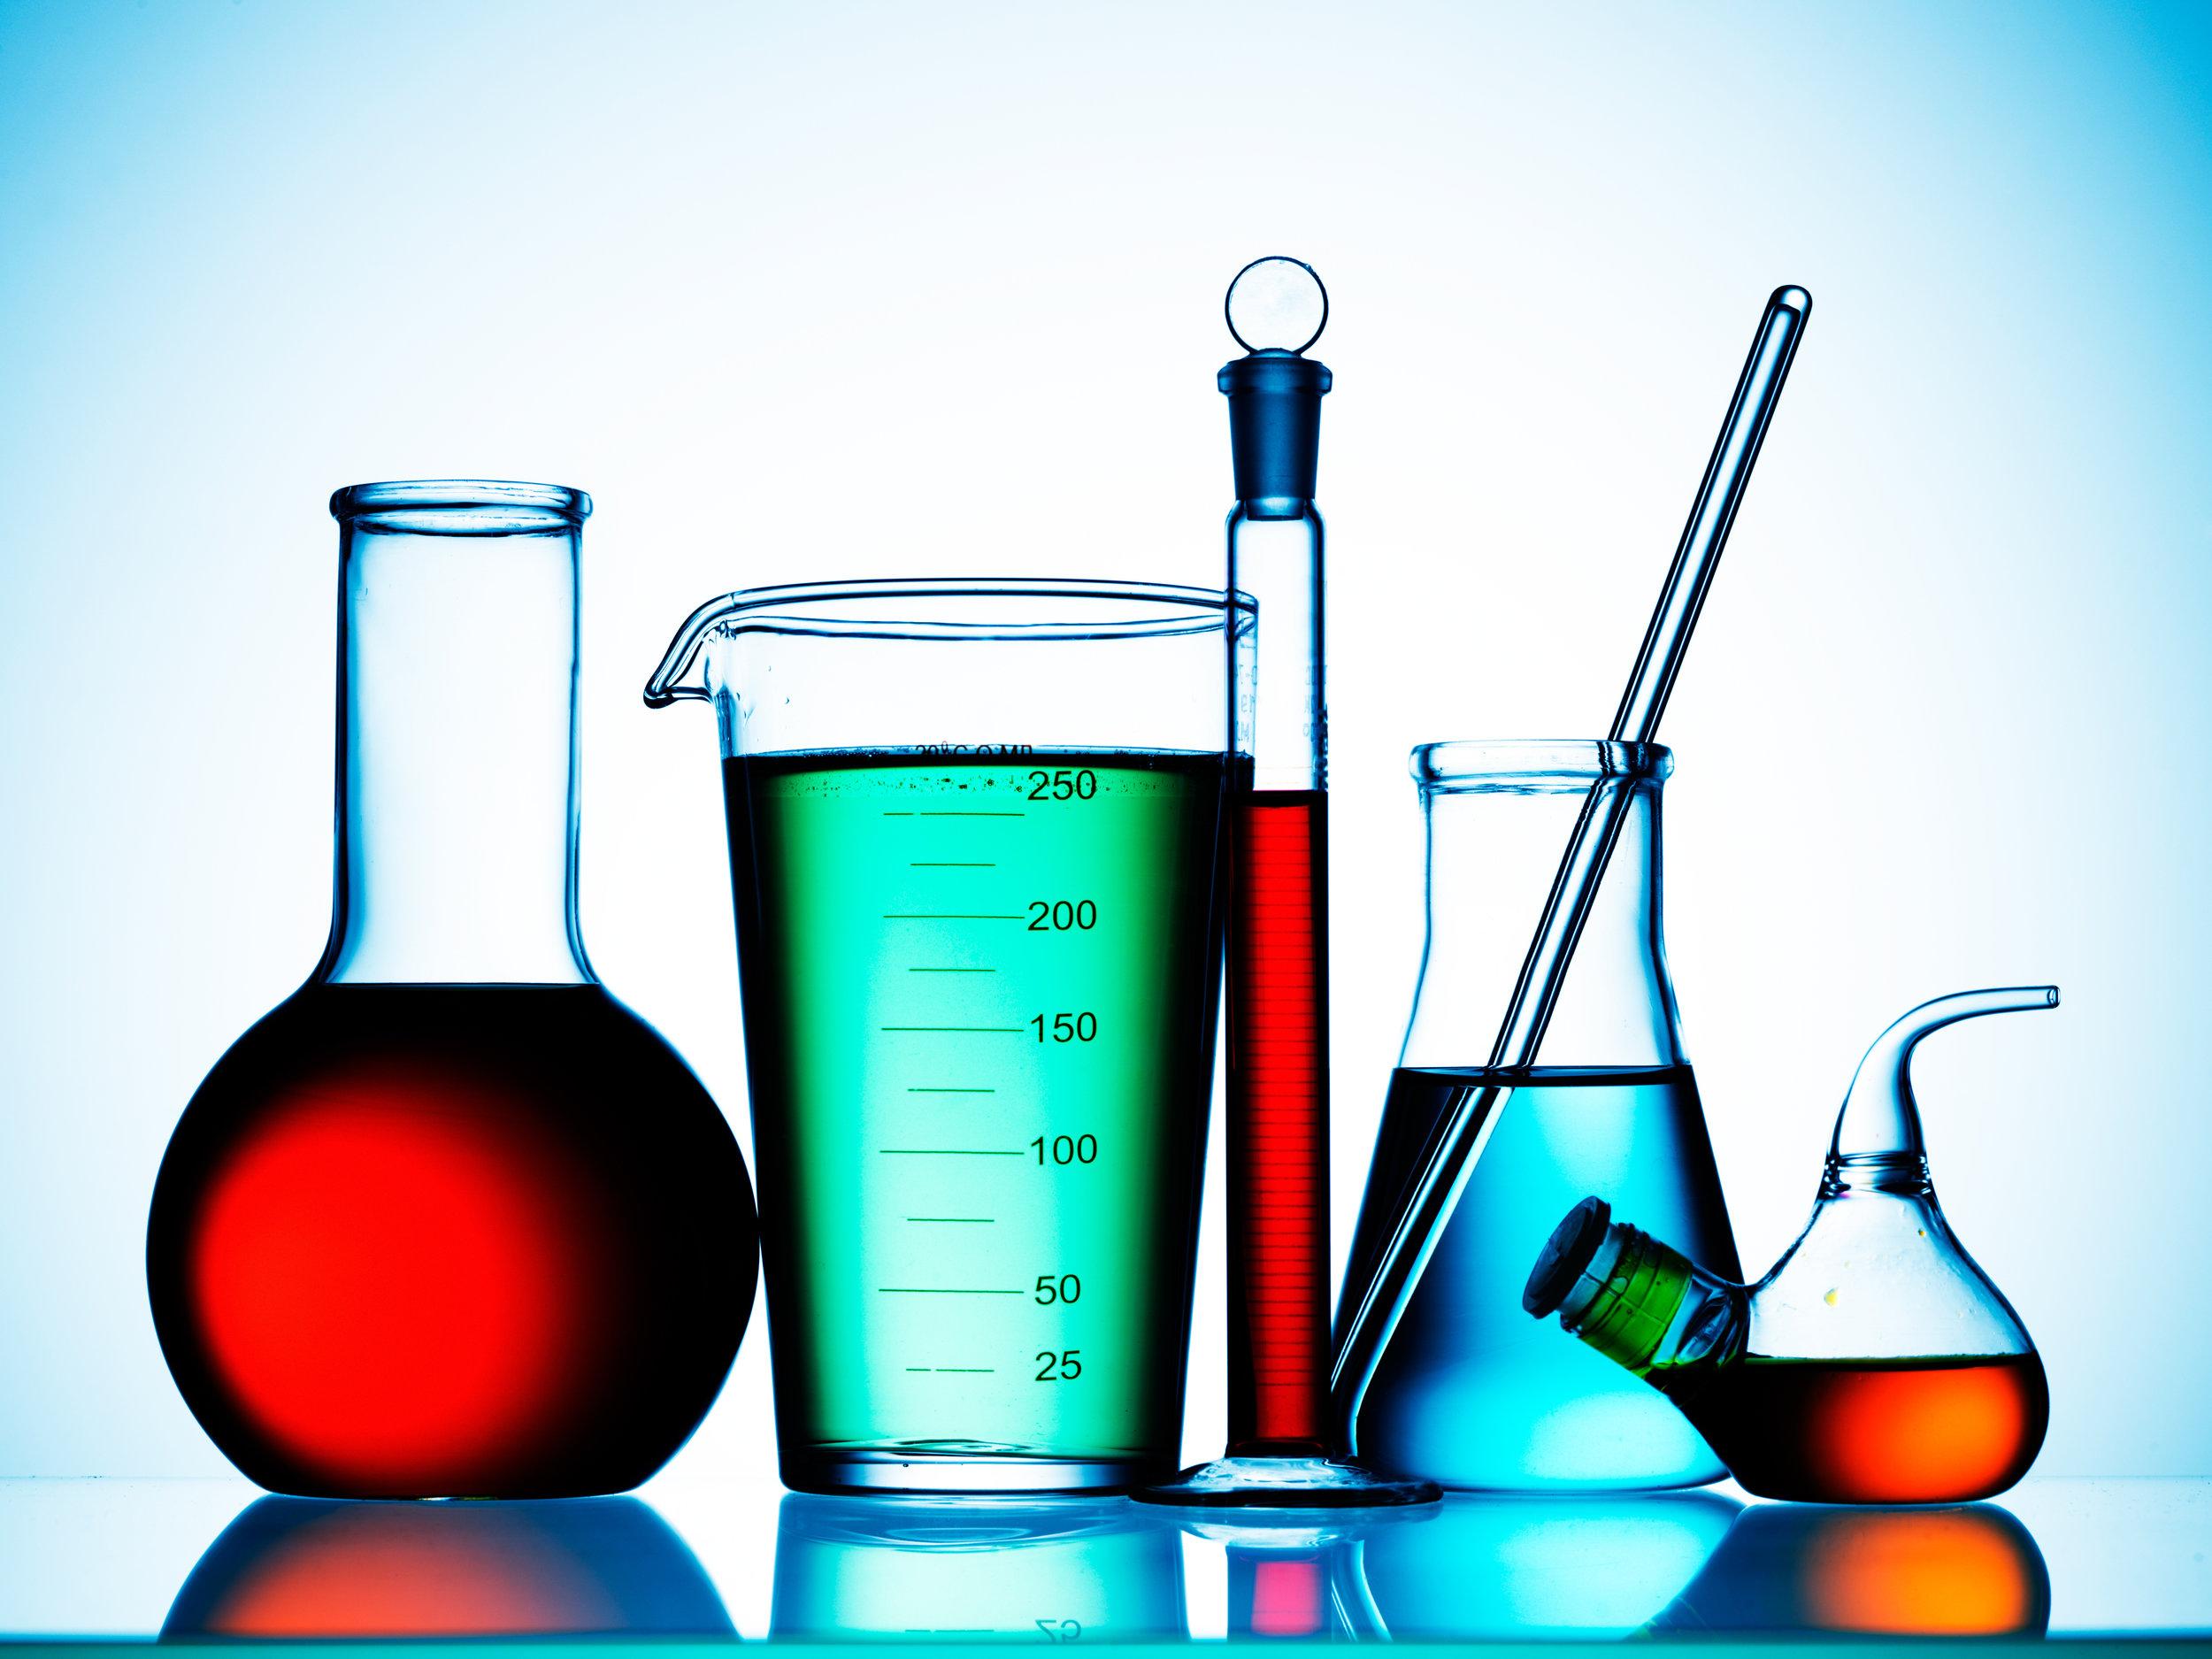 assorted_laboratory_glassware_hd_photo_21.jpg